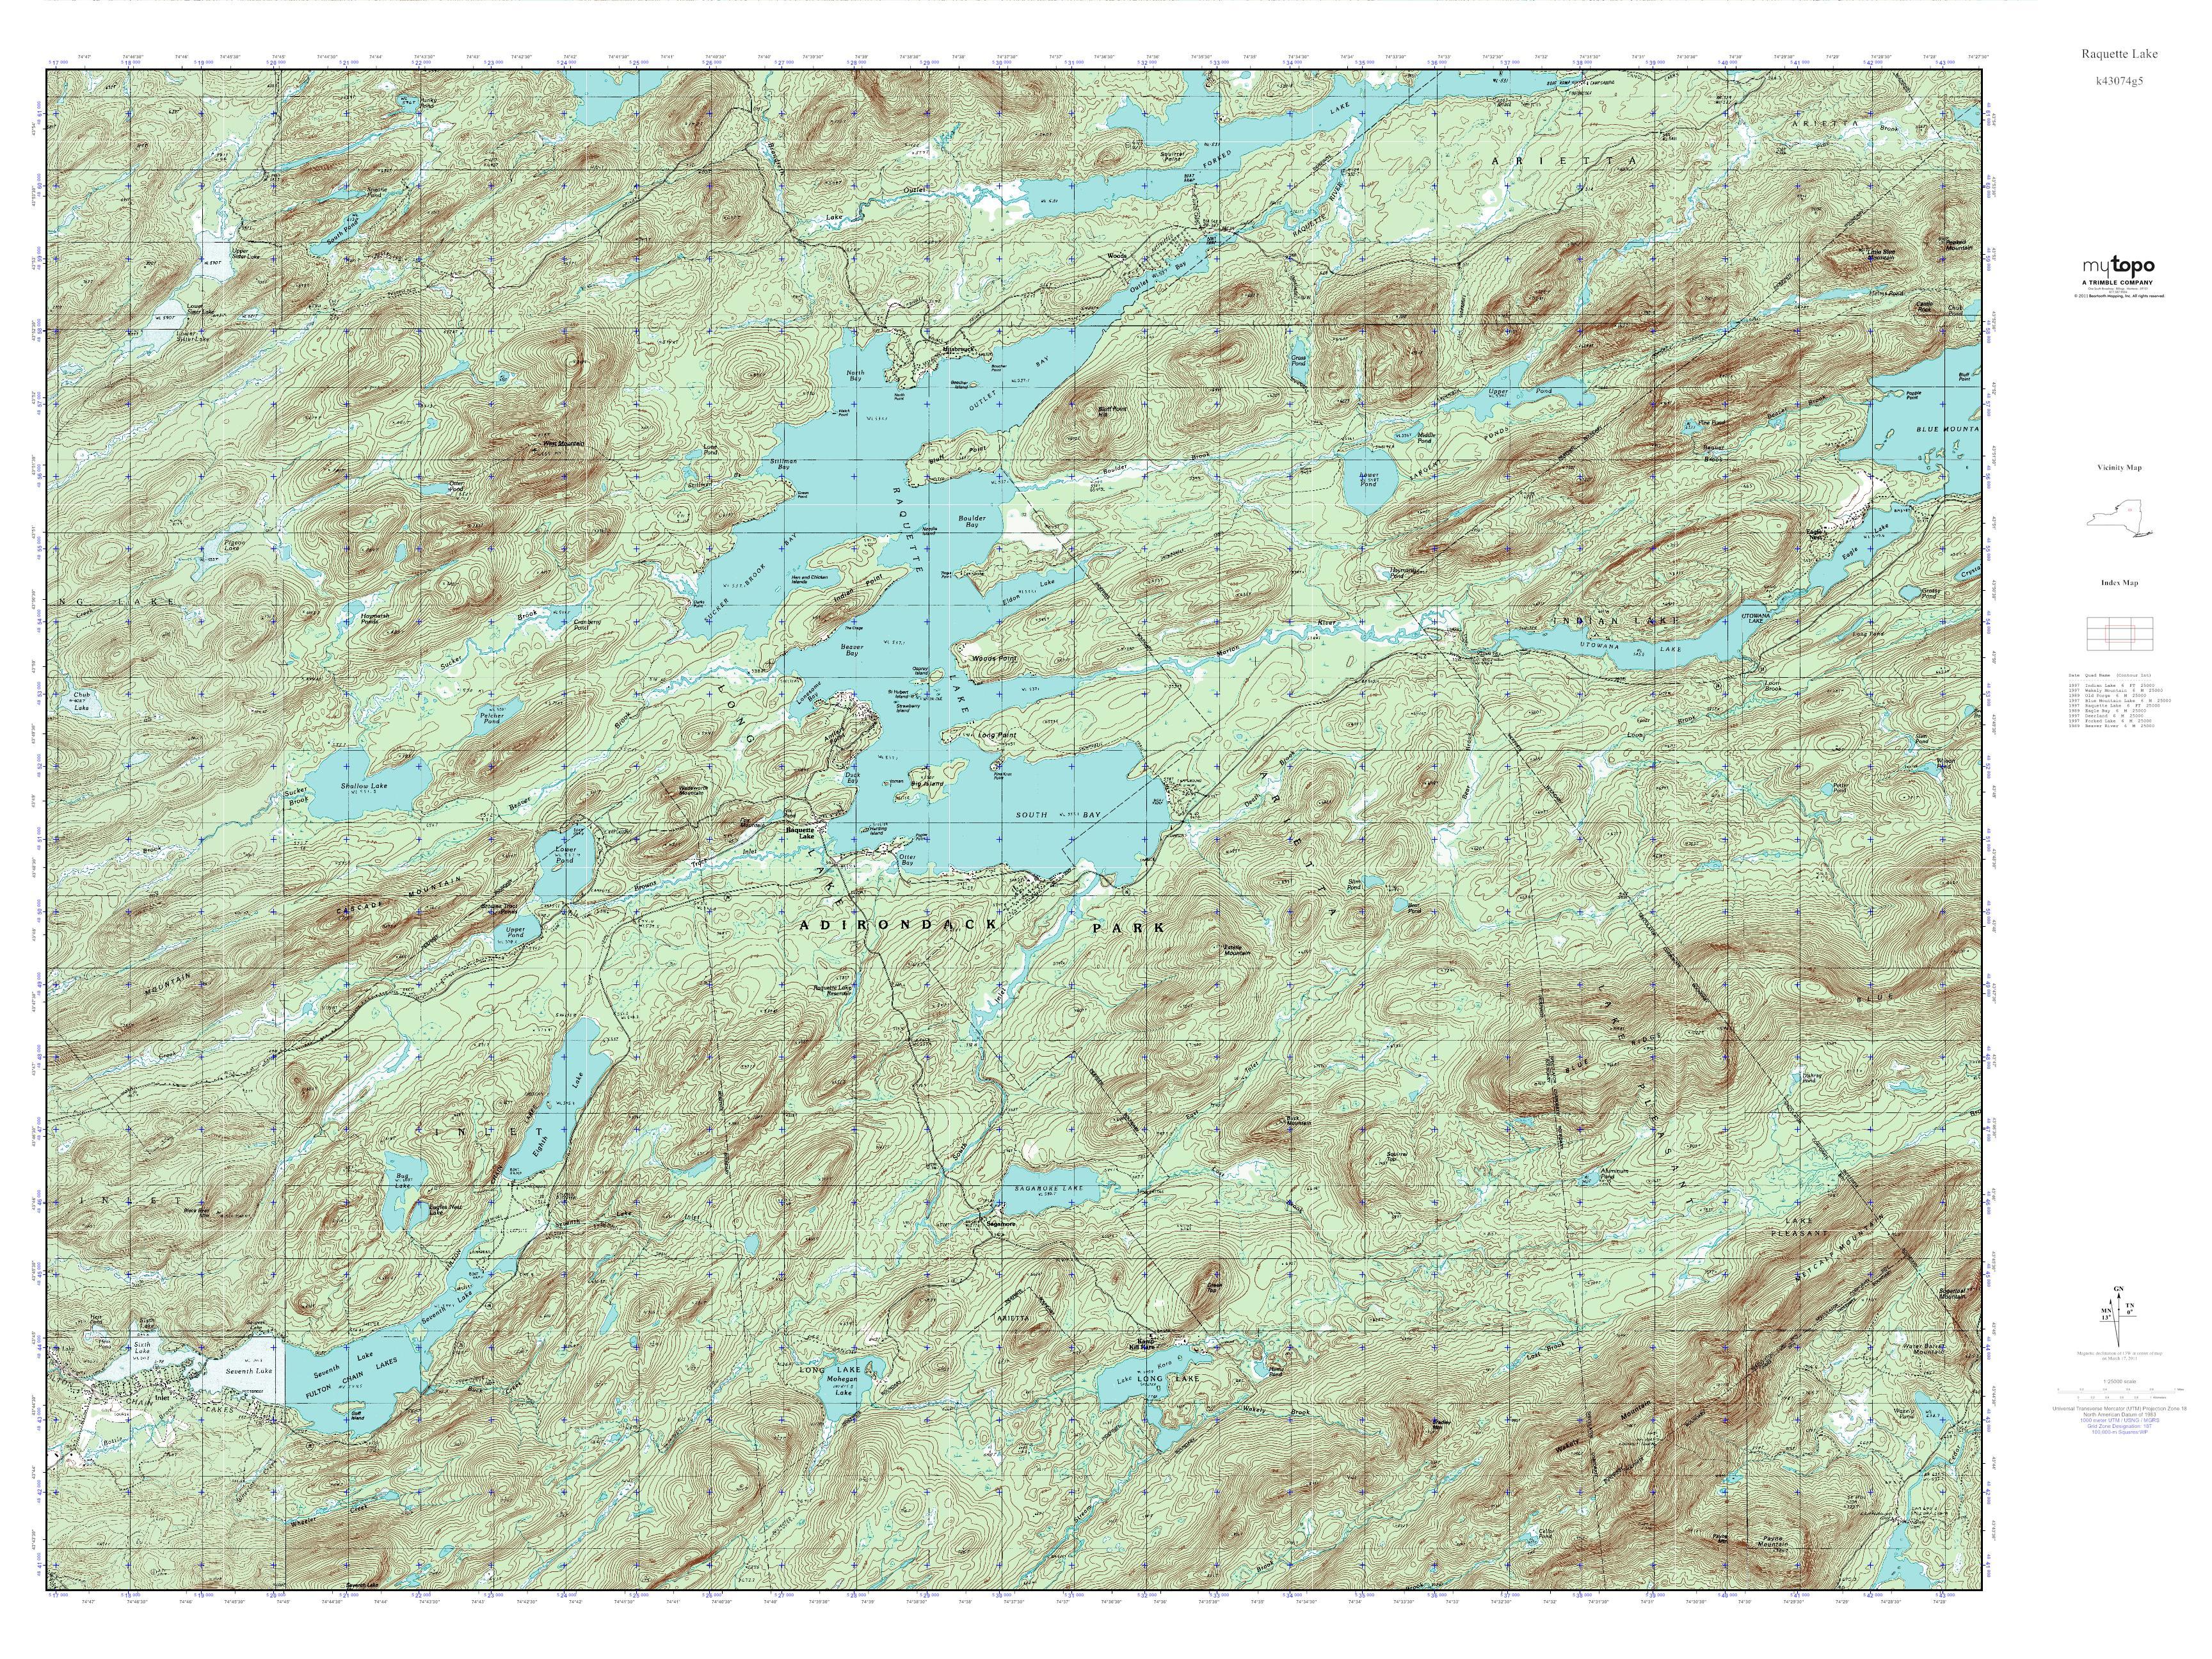 Mytopo Raquette Lake New York Usgs Quad Topo Map